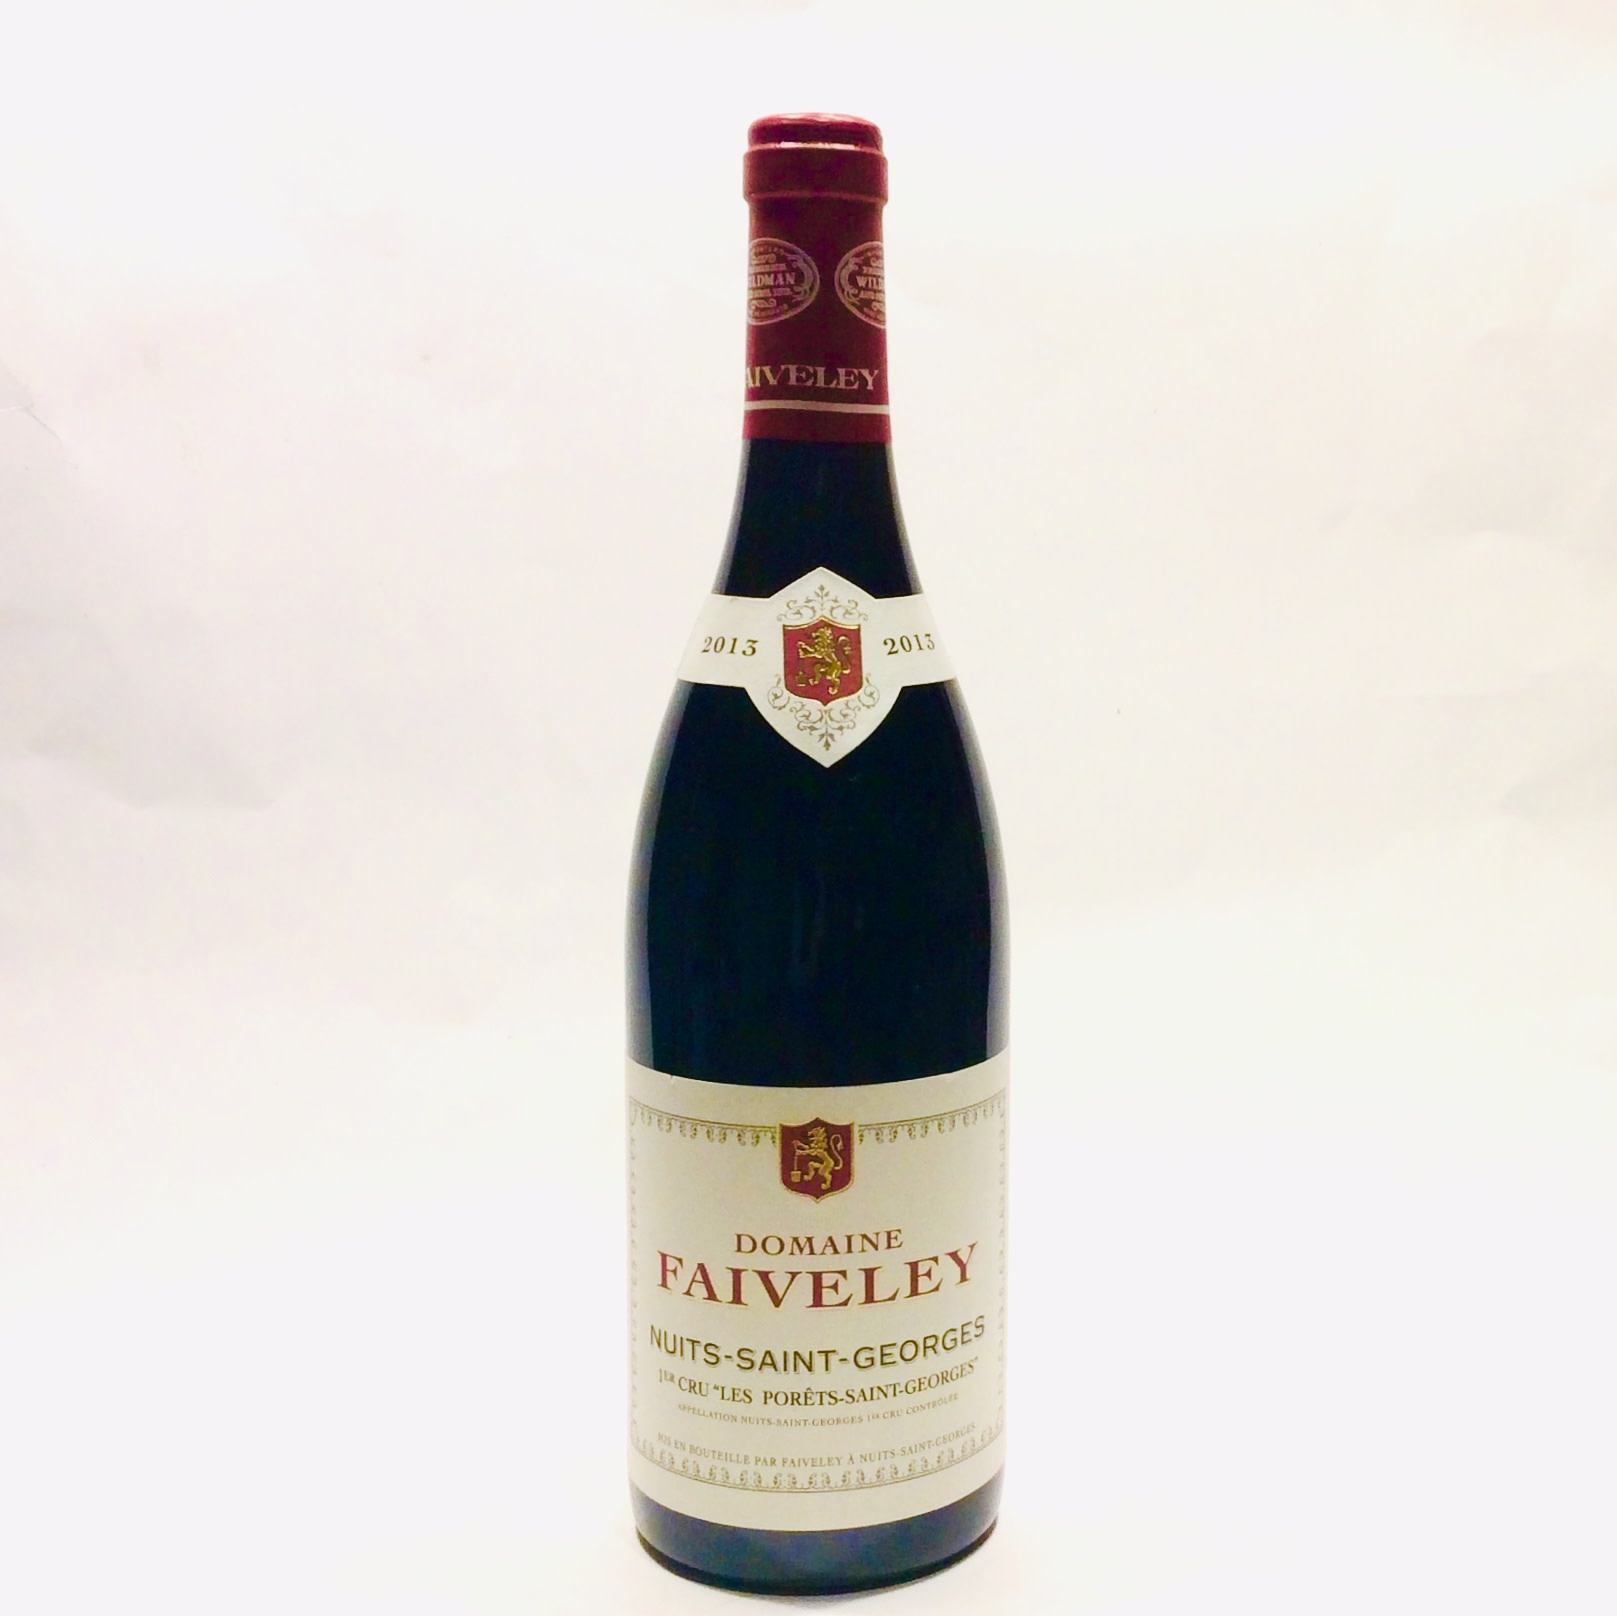 Faiveley - Nuits-Saint-Georges 1er Cru 2013 (750 ml)